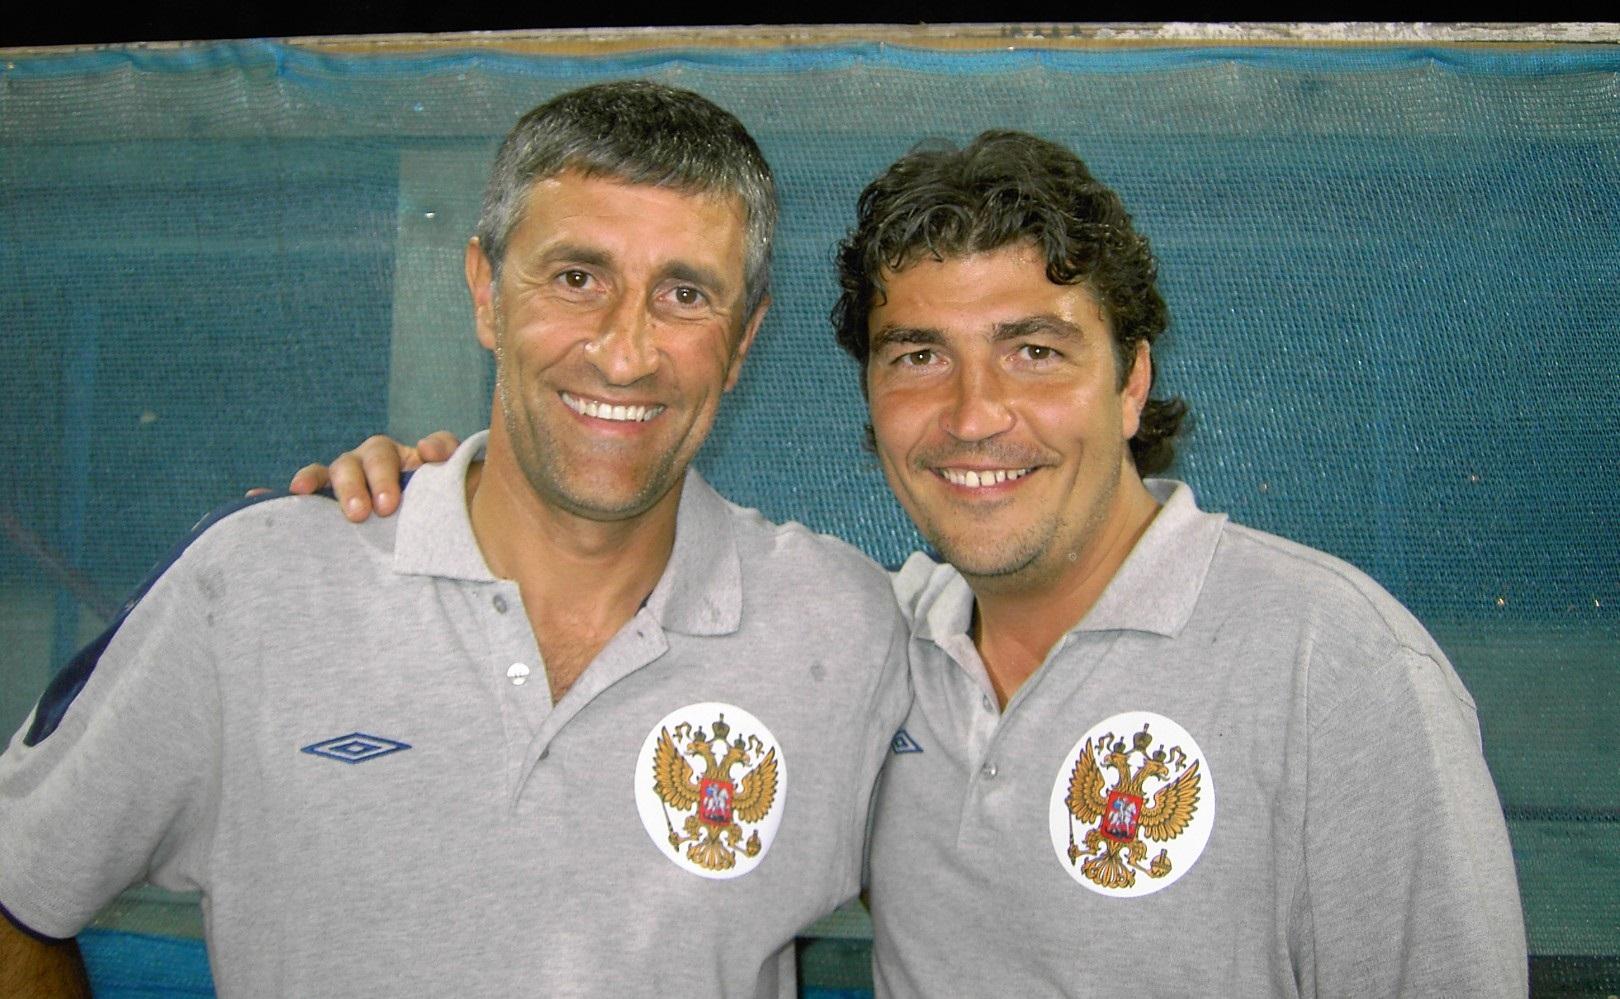 Сайт футбольного клуба барселона испан